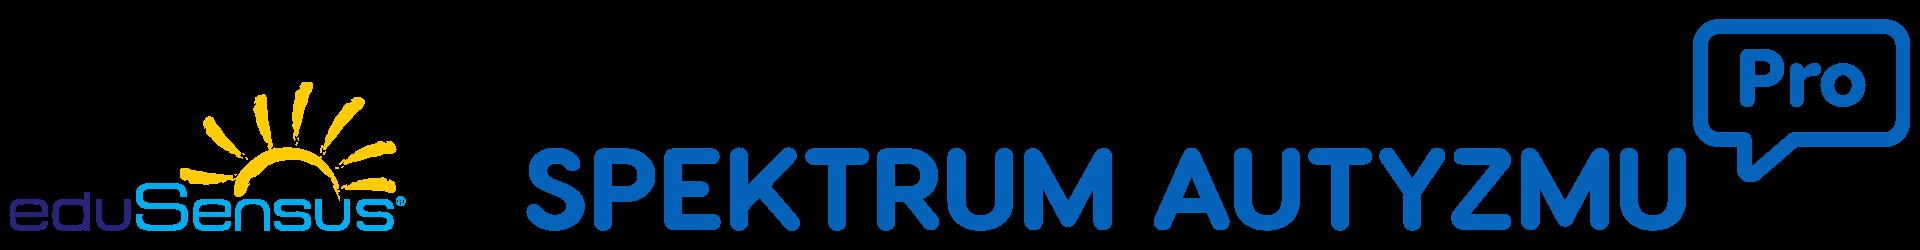 logo_eduSensus_SpektrumAutyzmu.png